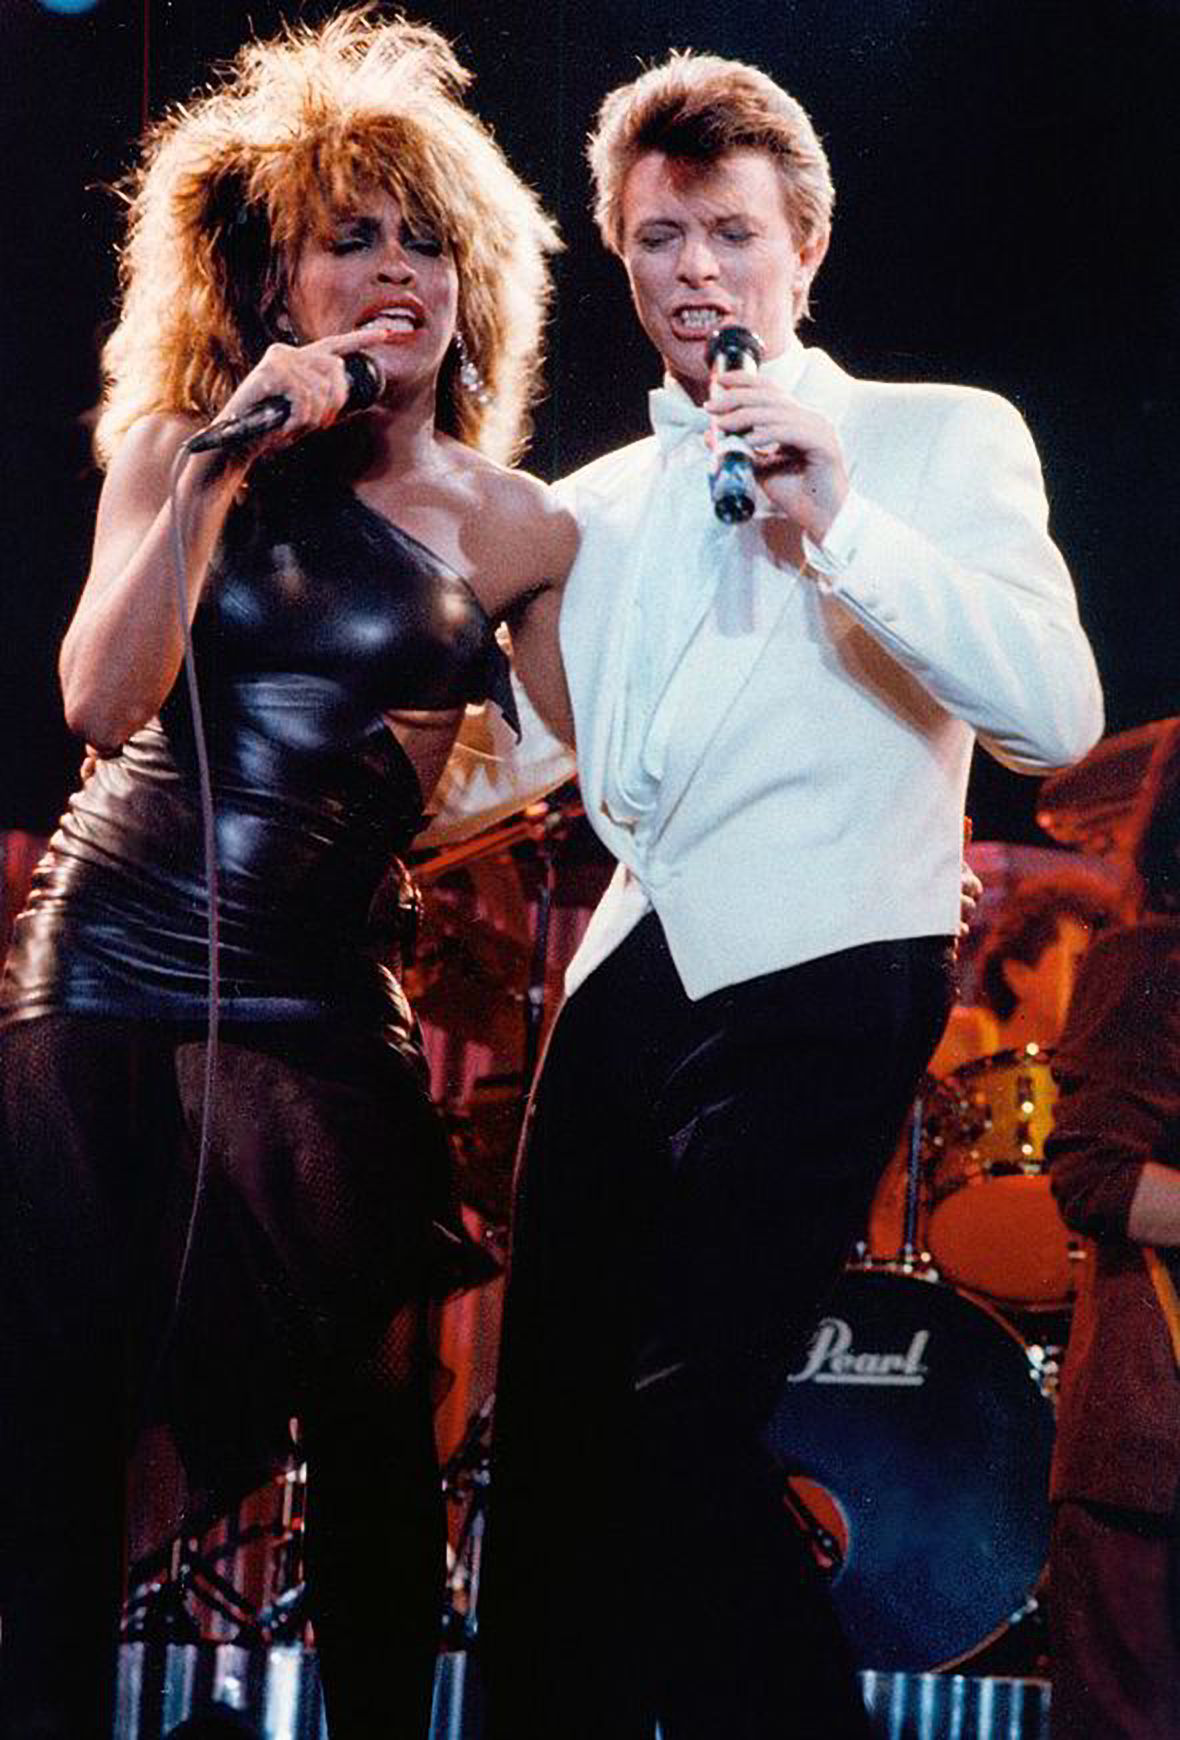 David Bowie and Tina Turner